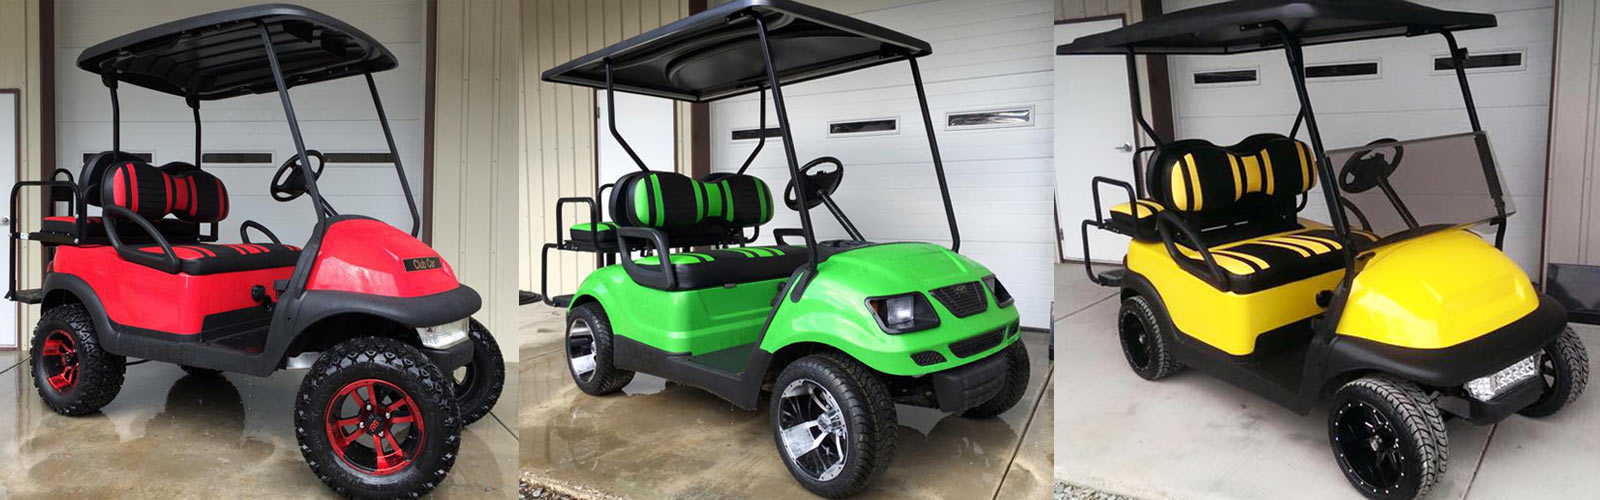 Brad's Golf Cars has a vast New golf cart inventory!